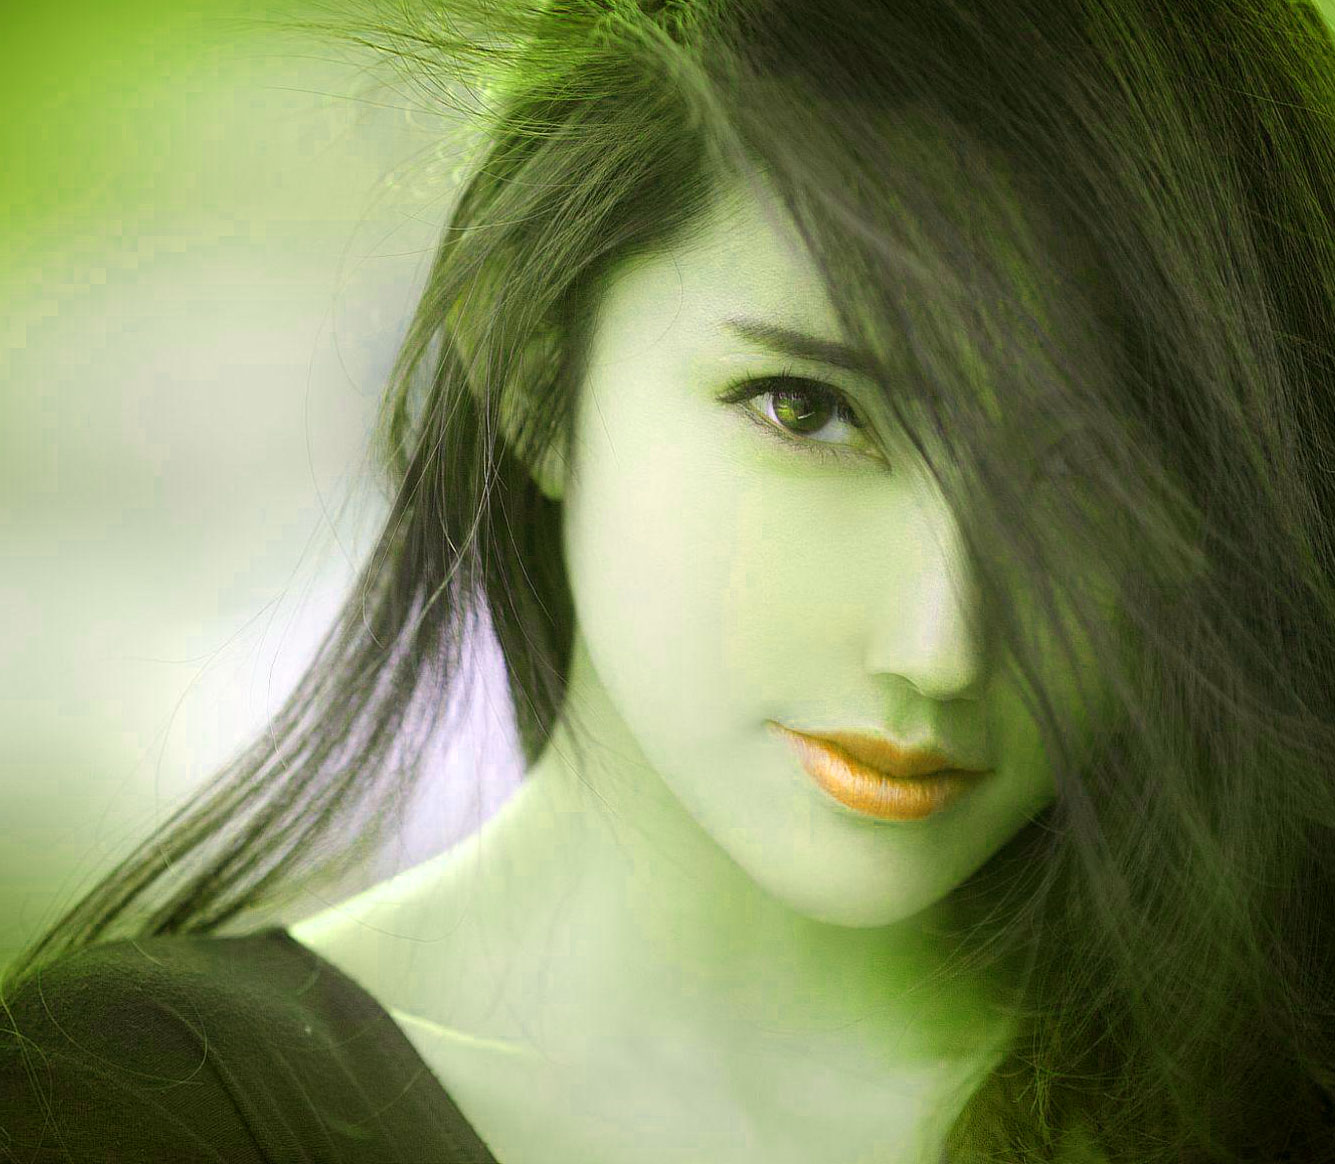 My Friend Beautiful Girls Images Pics 2